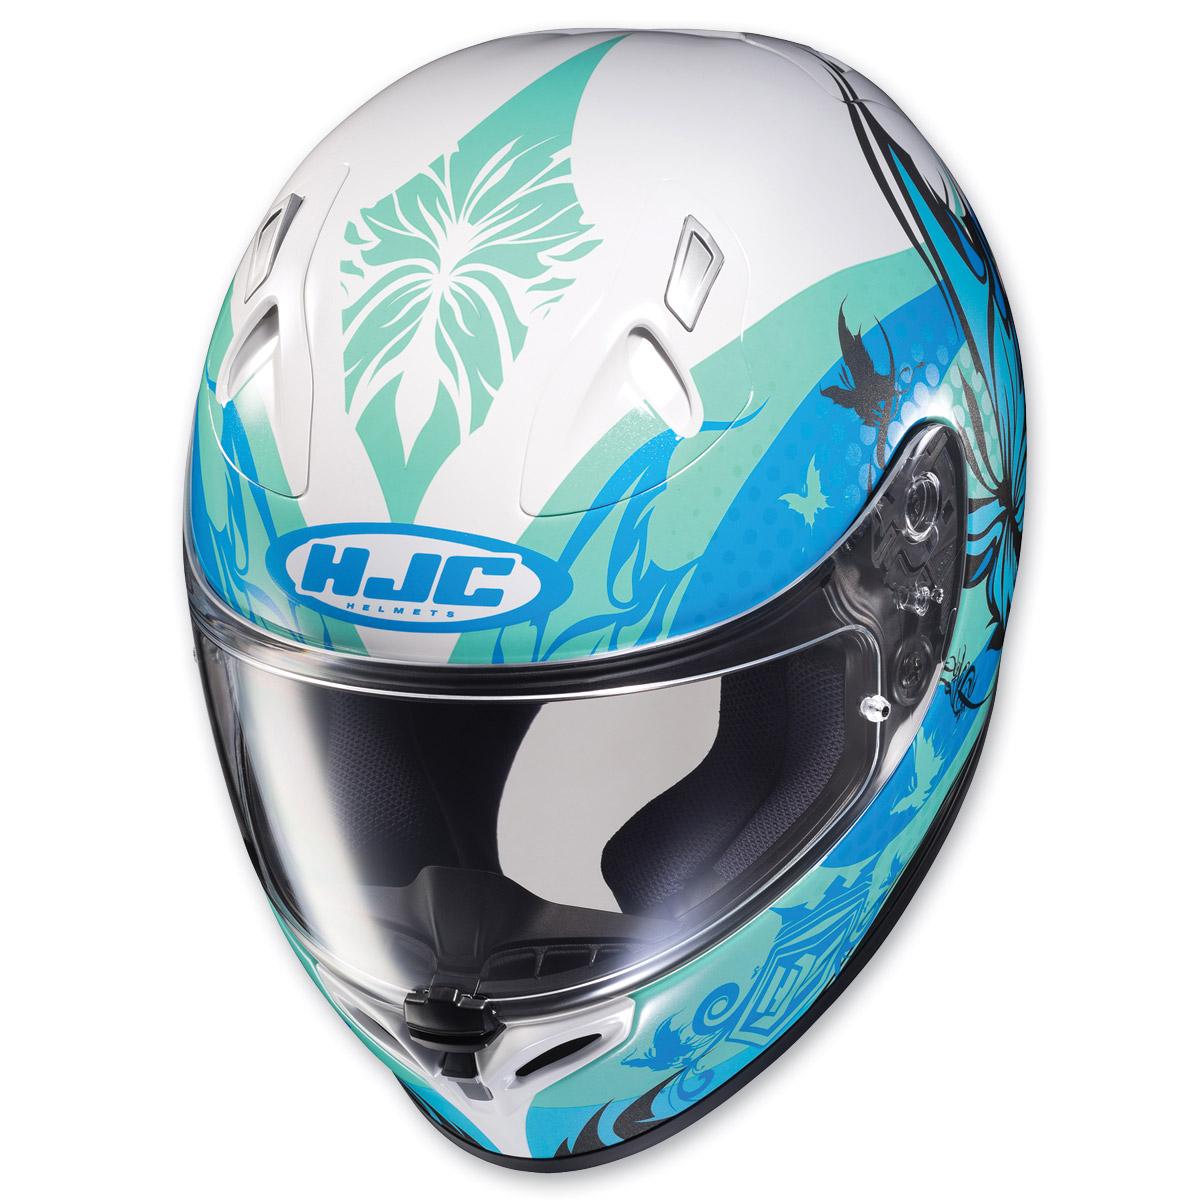 hjc fg 17 flutura blue white full face helmet 175 337 j p cycles. Black Bedroom Furniture Sets. Home Design Ideas